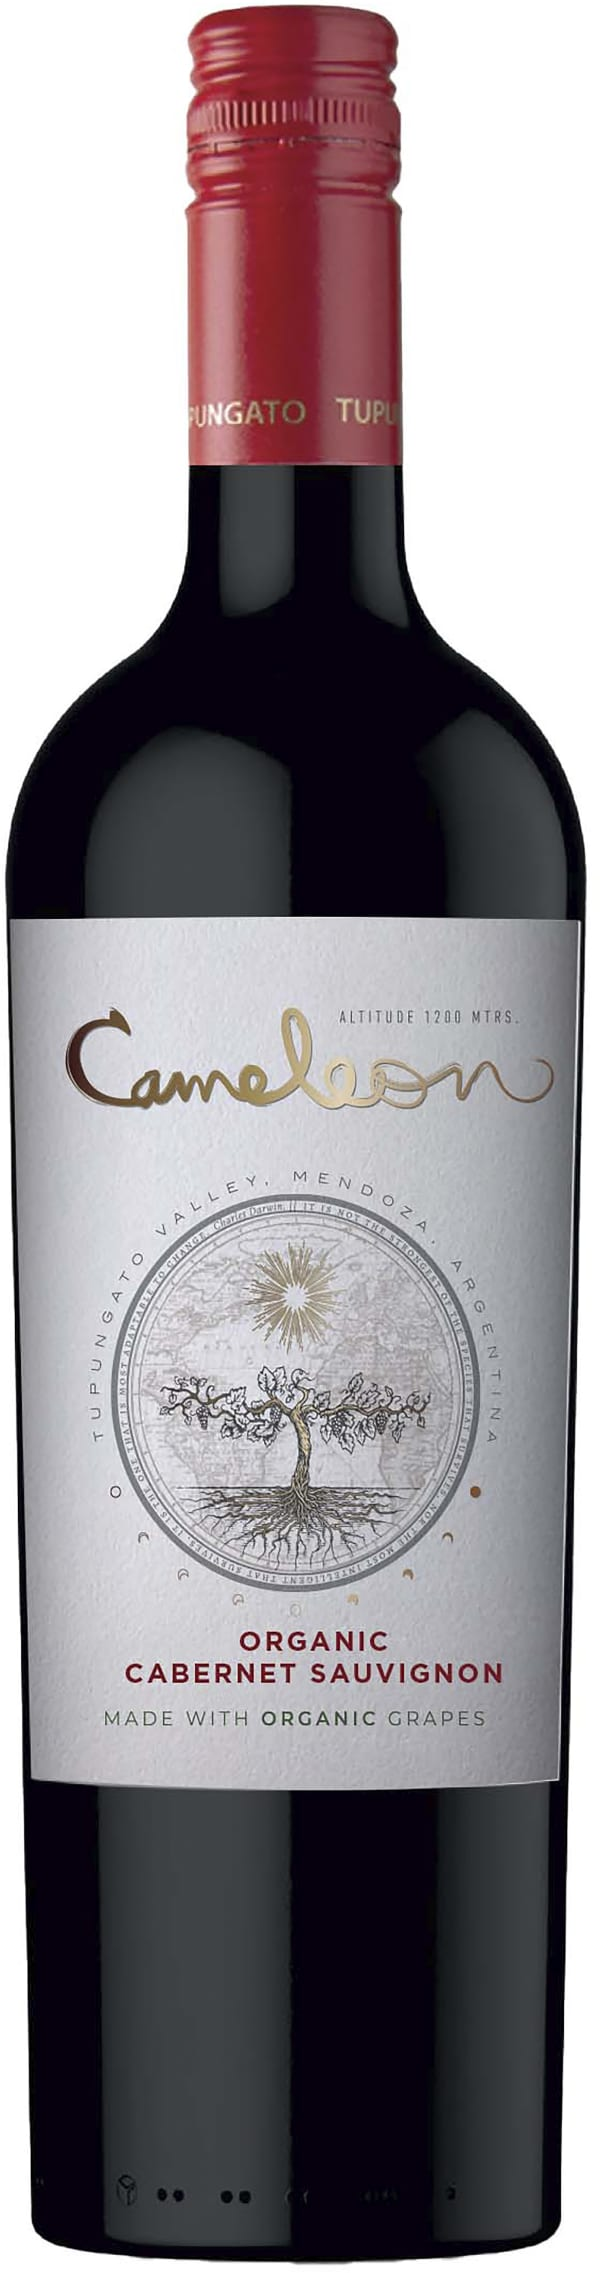 Cameleon Organic Cabernet Sauvignon 2016